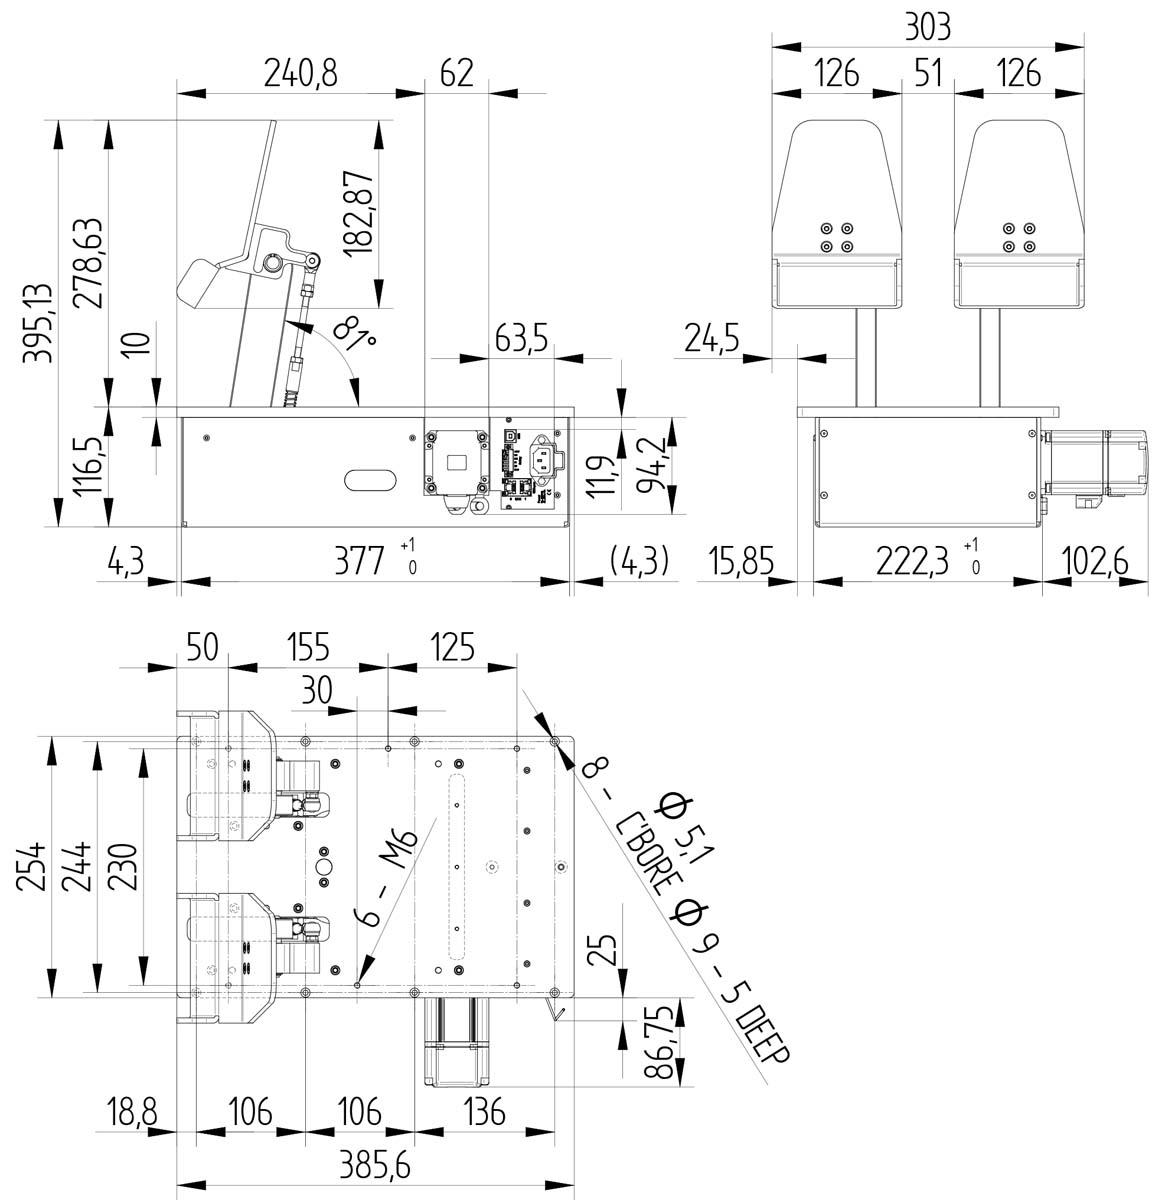 ch pro pedals usb wiring diagram eldebo wiring diagram